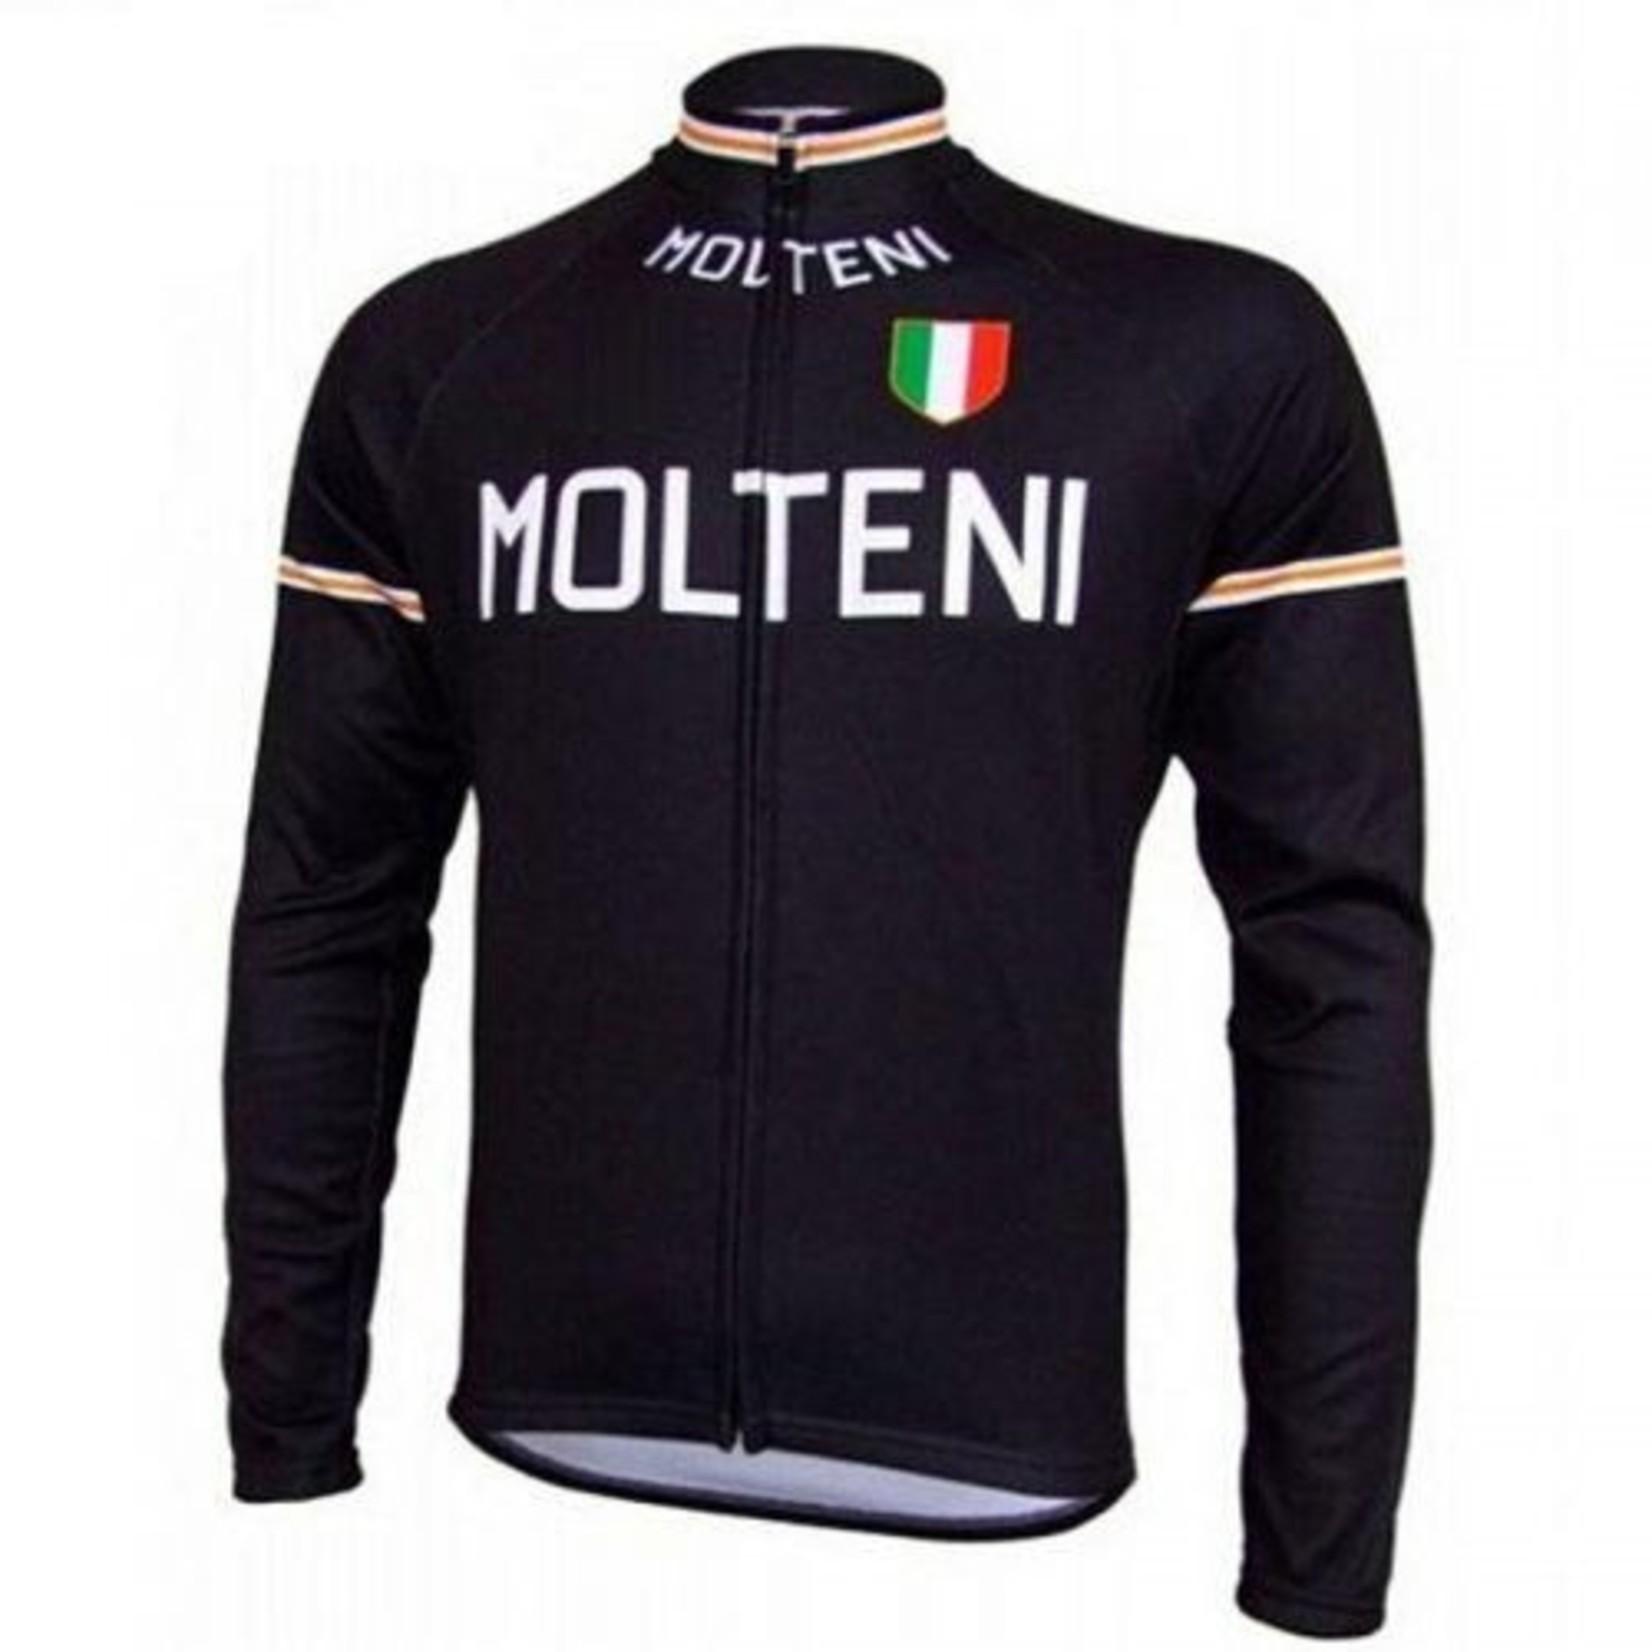 Retroshirt 'Molteni' Long sleeves 6XL